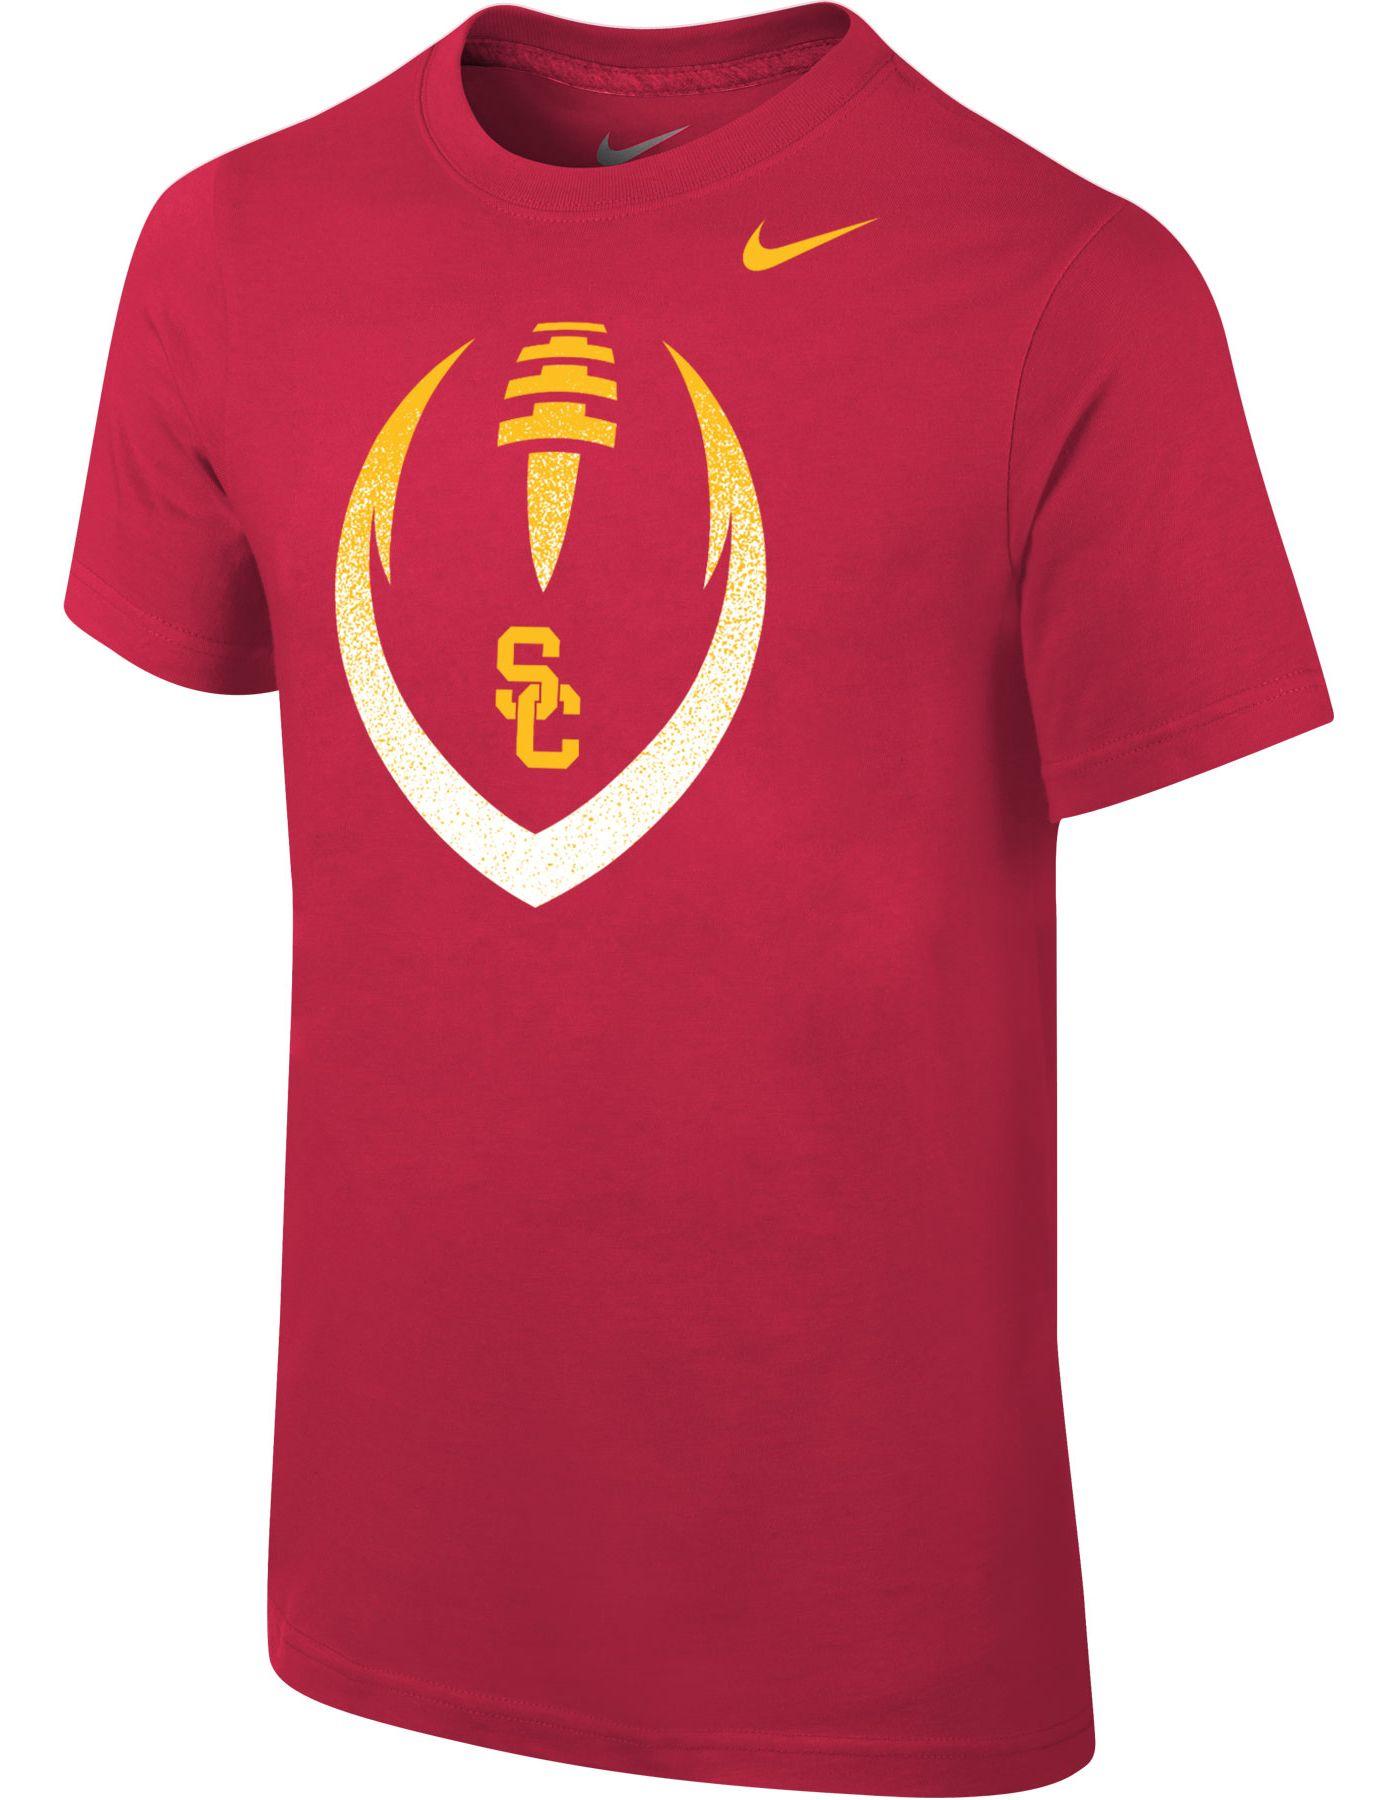 Nike Youth USC Trojans Cardinal Cotton Football Icon T-Shirt